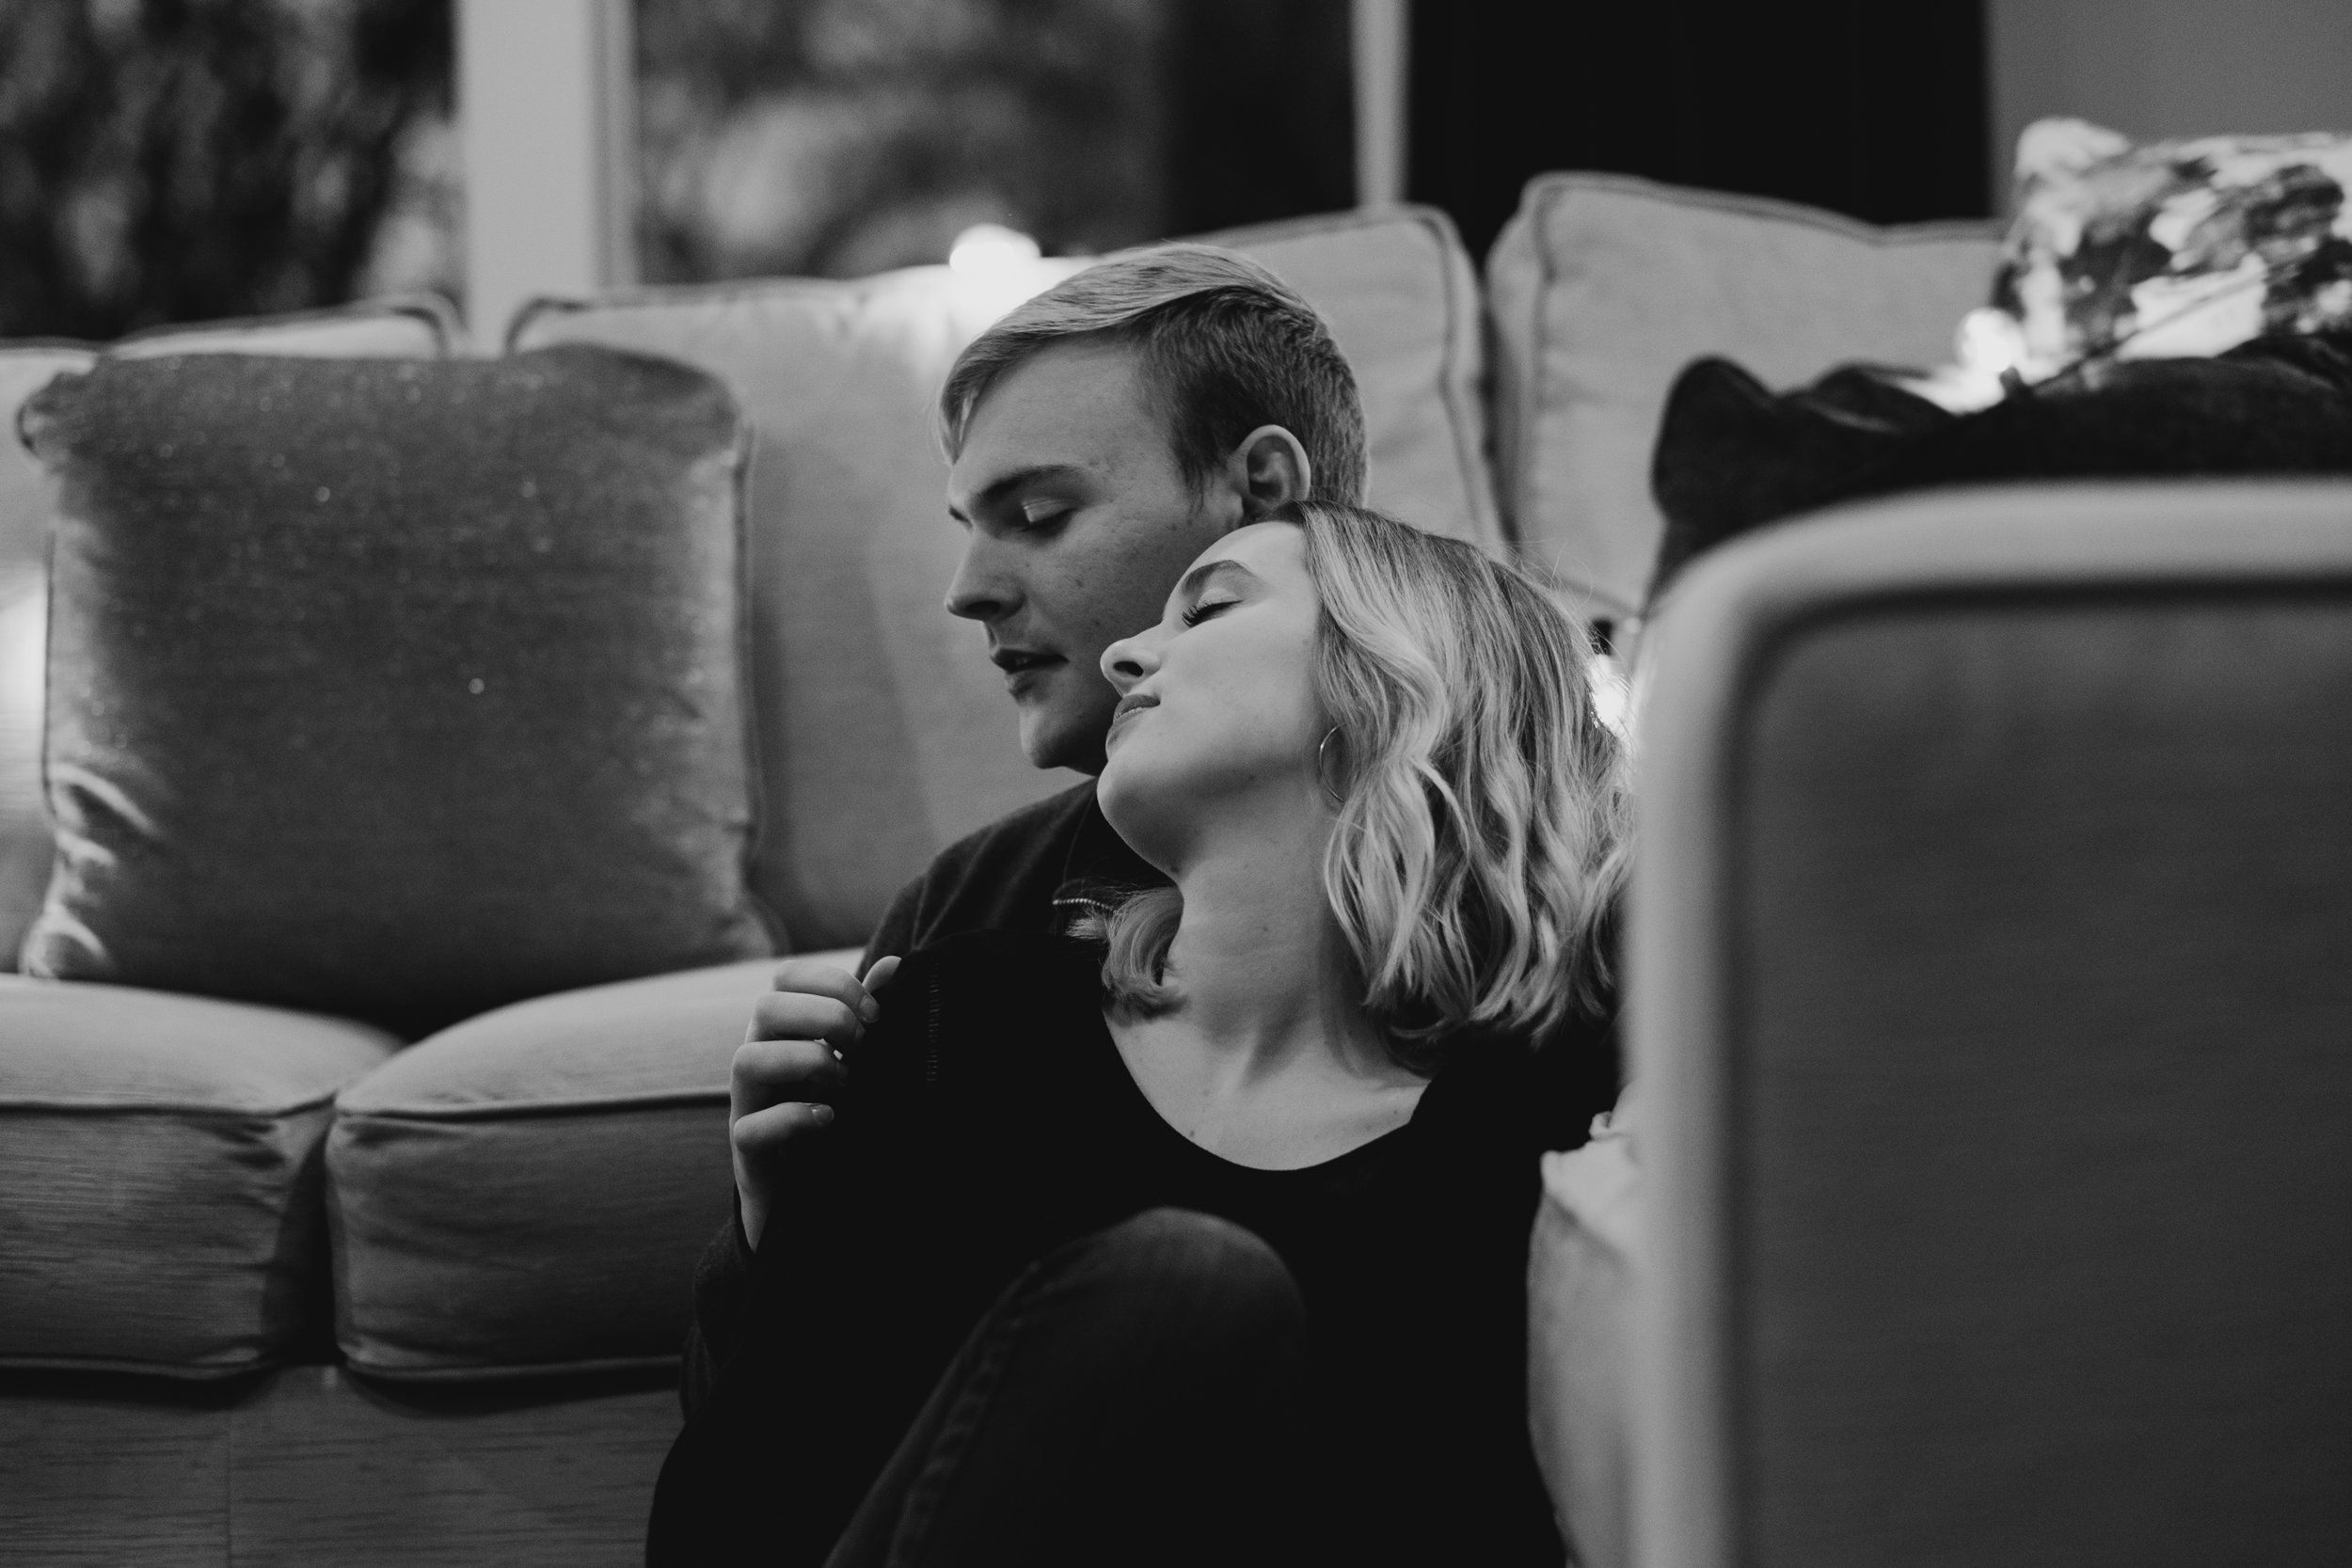 Talia + Brendan | Engagement Photography | Sioux Falls, South Dakota Photographer-171.jpg